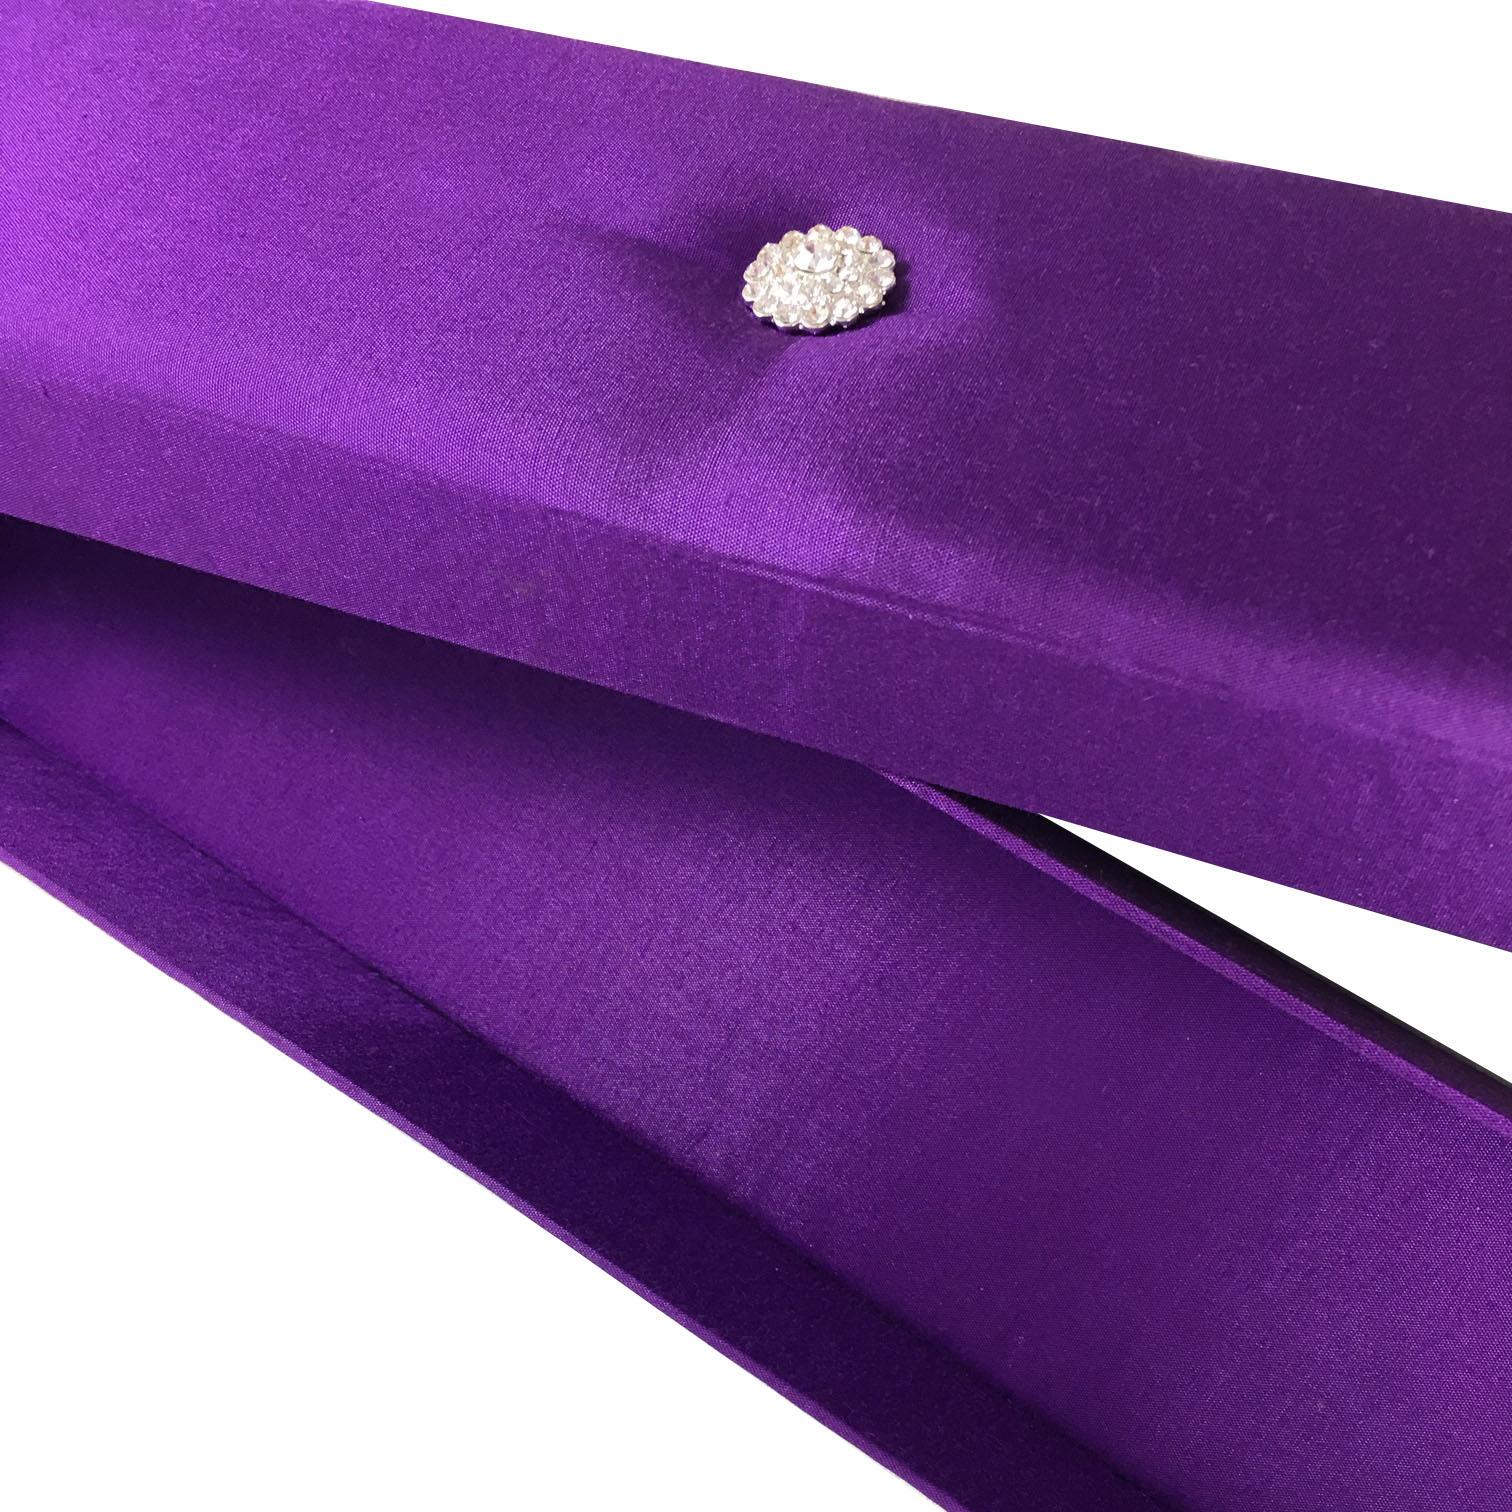 purple wedding scroll box with rhinestones